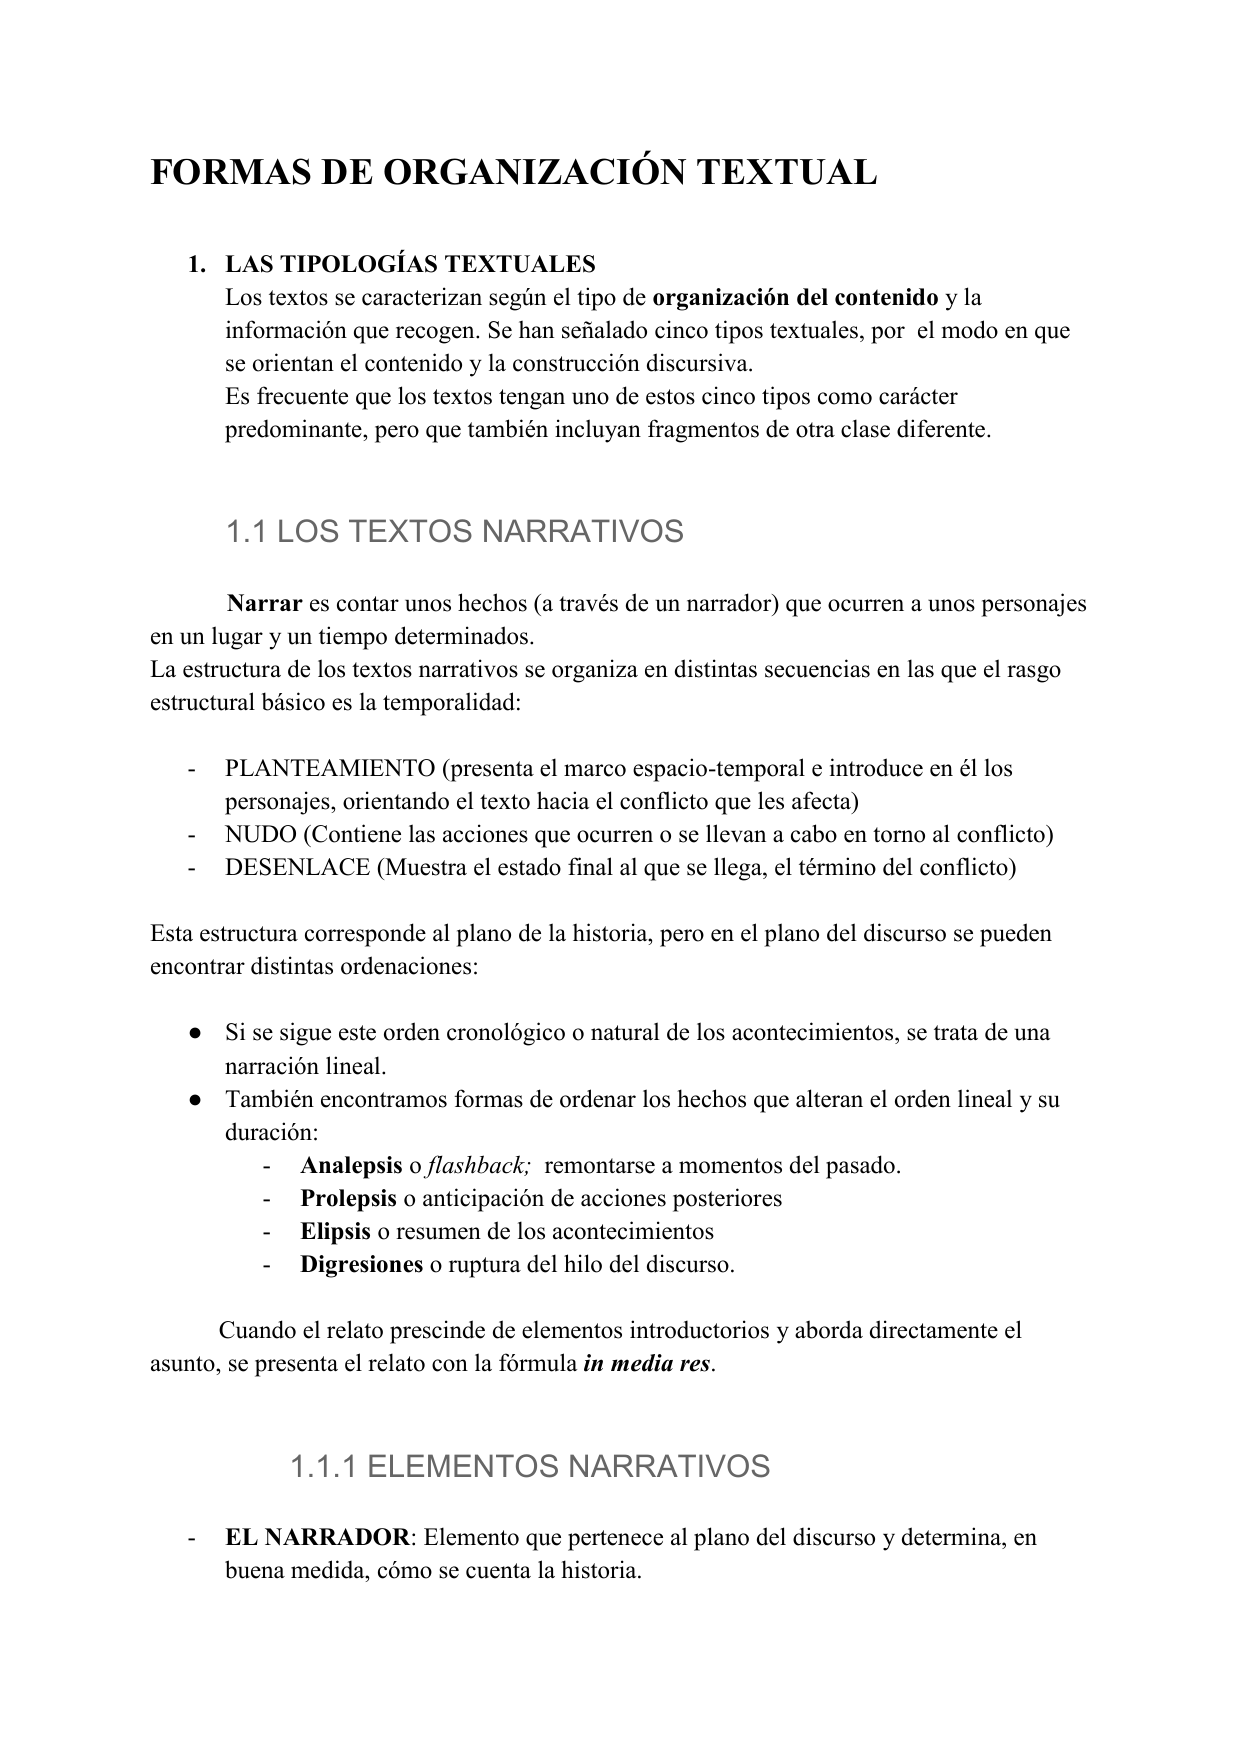 Formas De Organización Textual